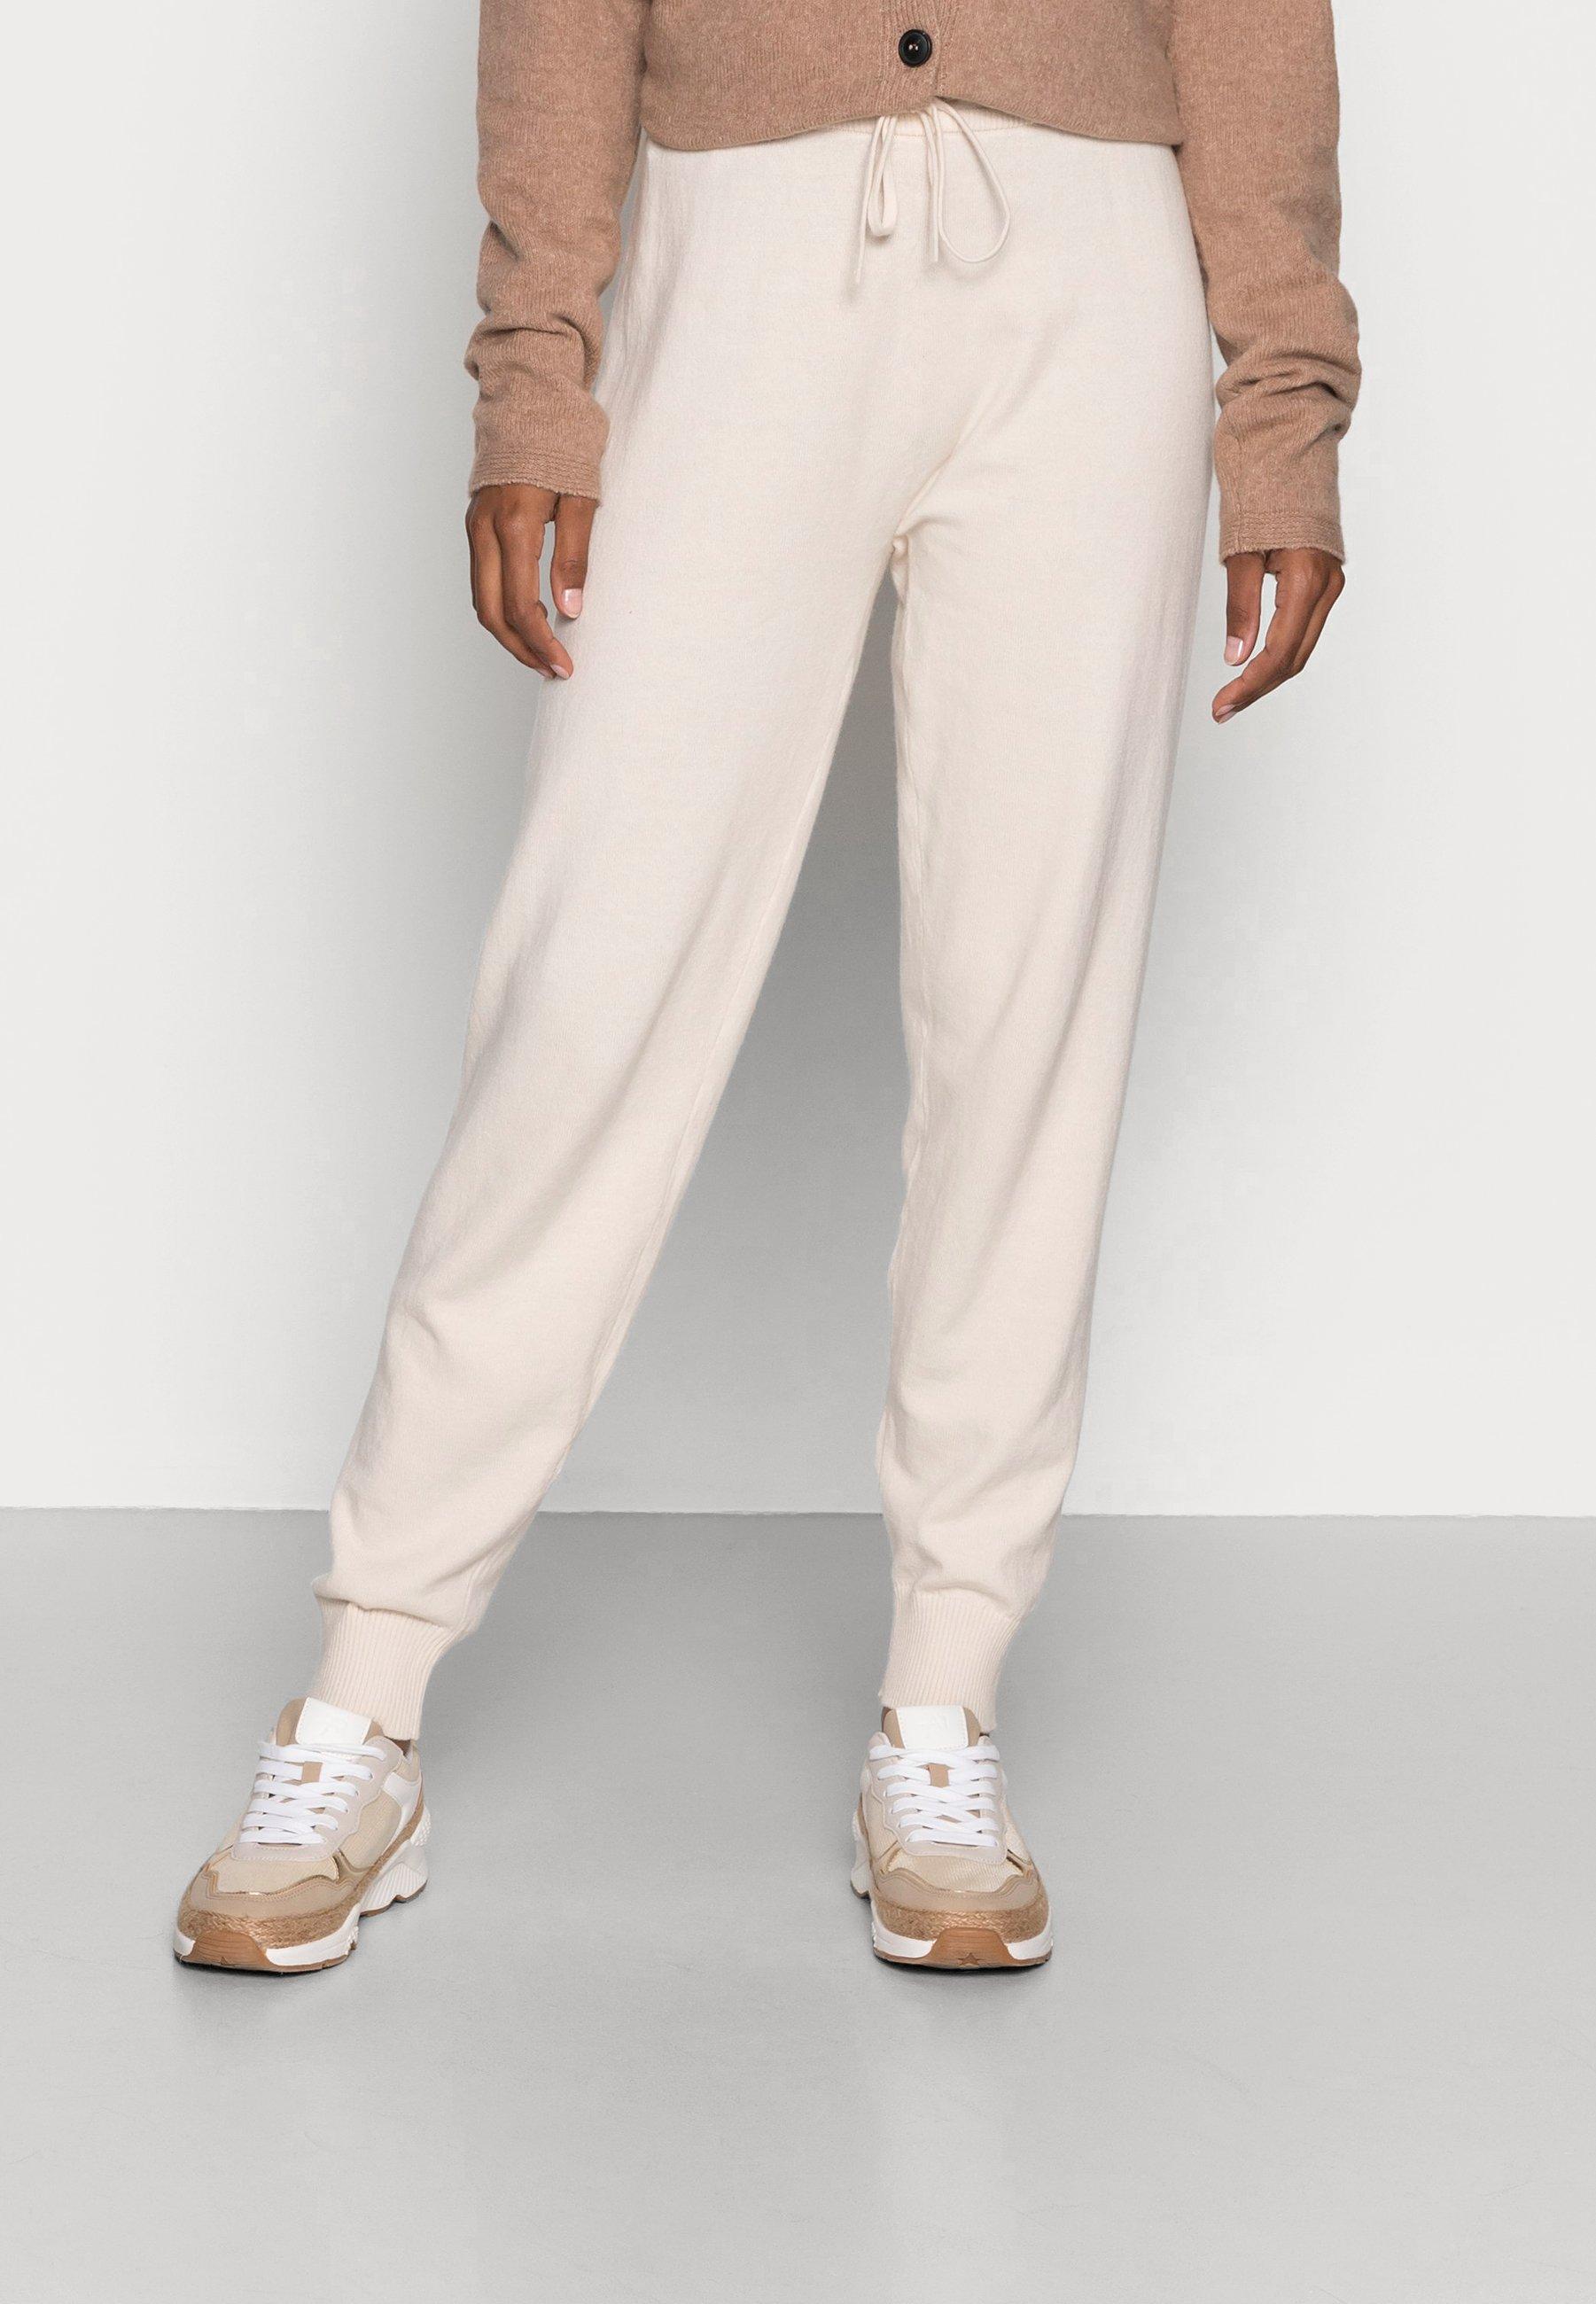 Damen ZAMONA STRING PANT - Jogginghose